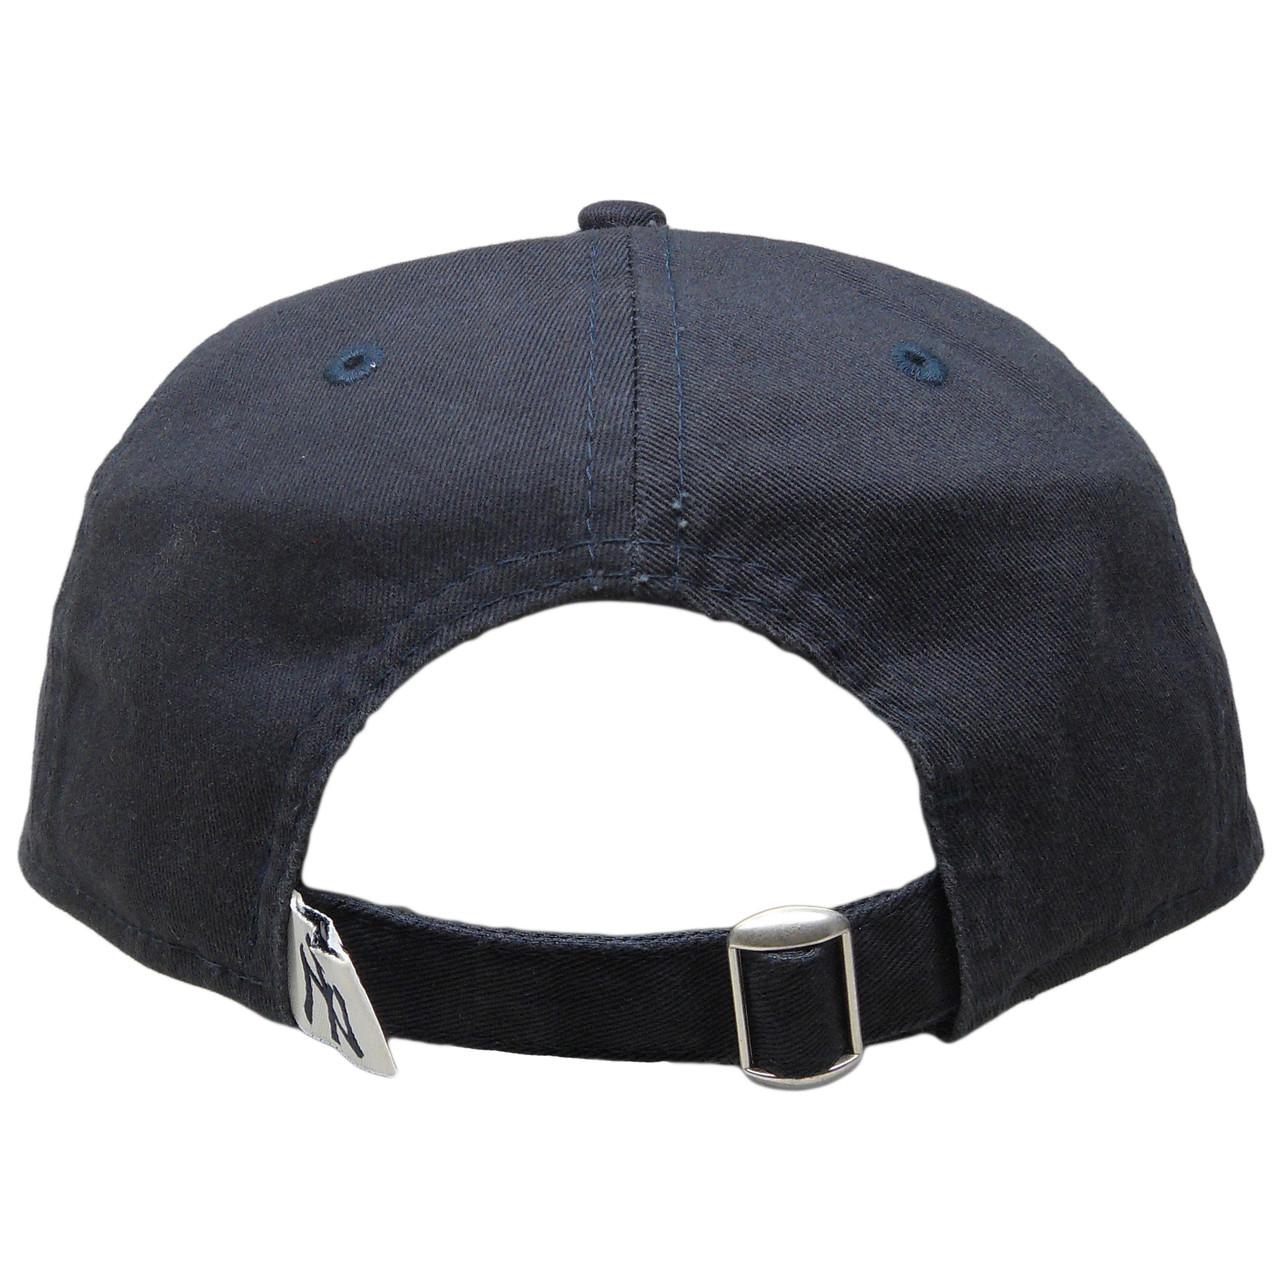 dbda6d974a350 New York Yankees New Era Core Classic 9Twenty Adjustable Hat - Navy ...